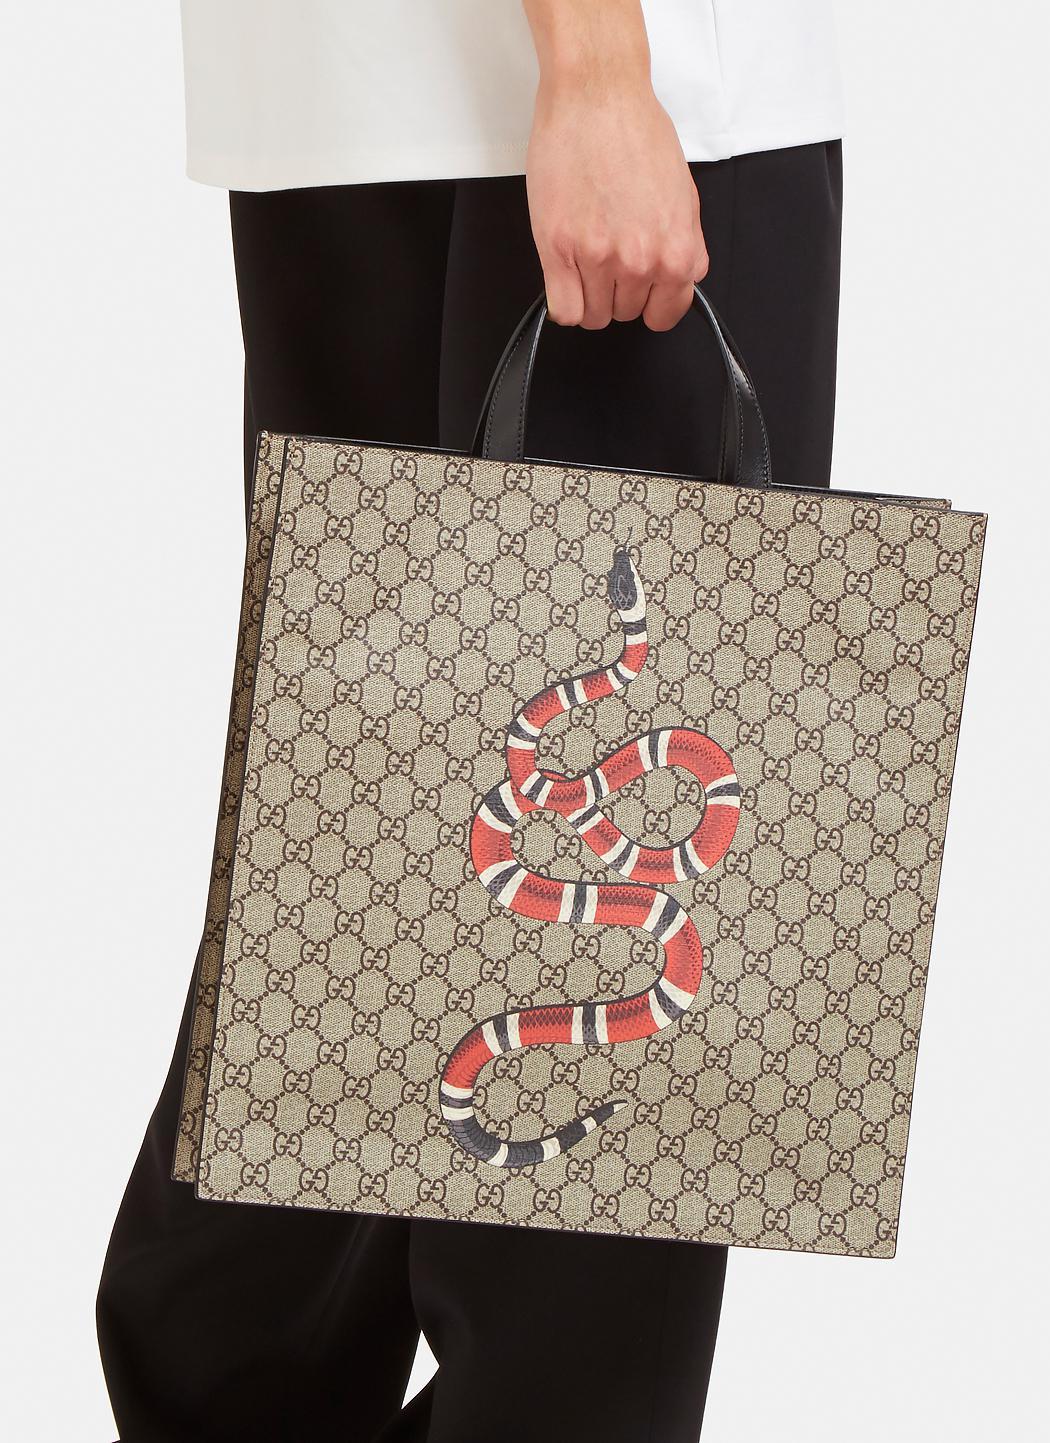 c04ad68668c8b8 Gucci Men's Snake Print Gg Supreme Tote Bag In Brown in Brown - Lyst